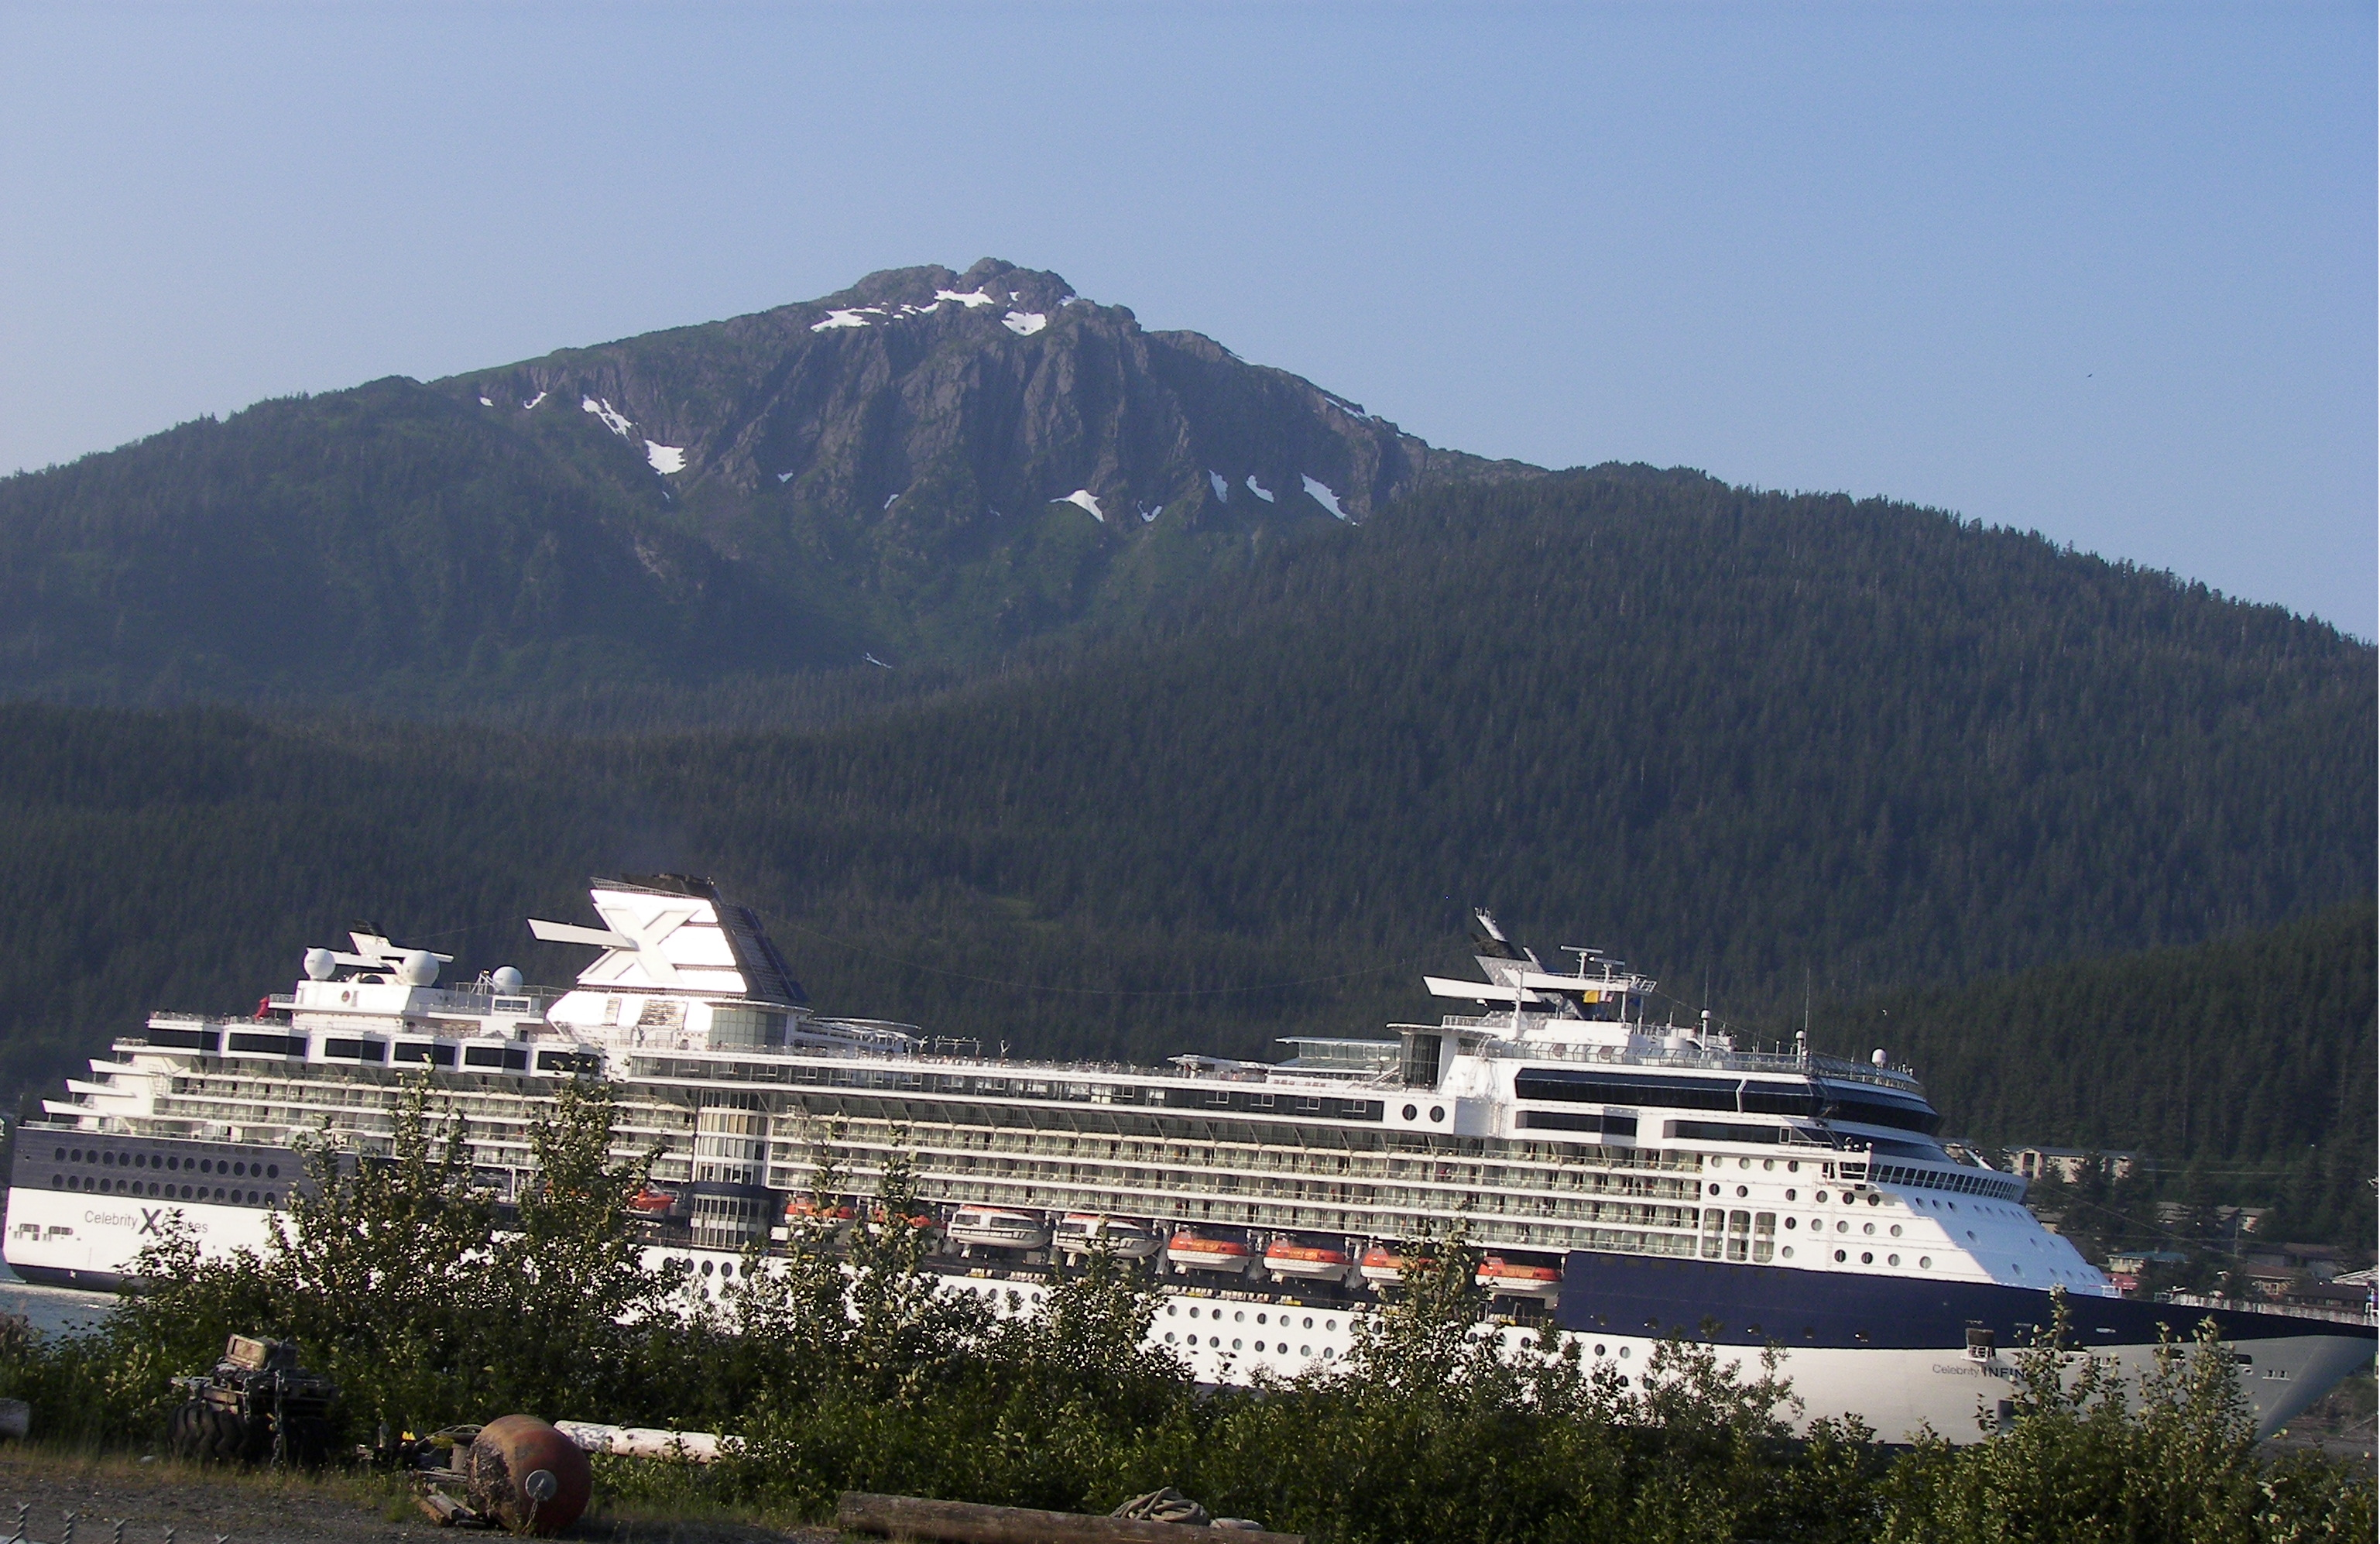 Vancouver to Alaska cruise on Celebrity Infinity - YouTube